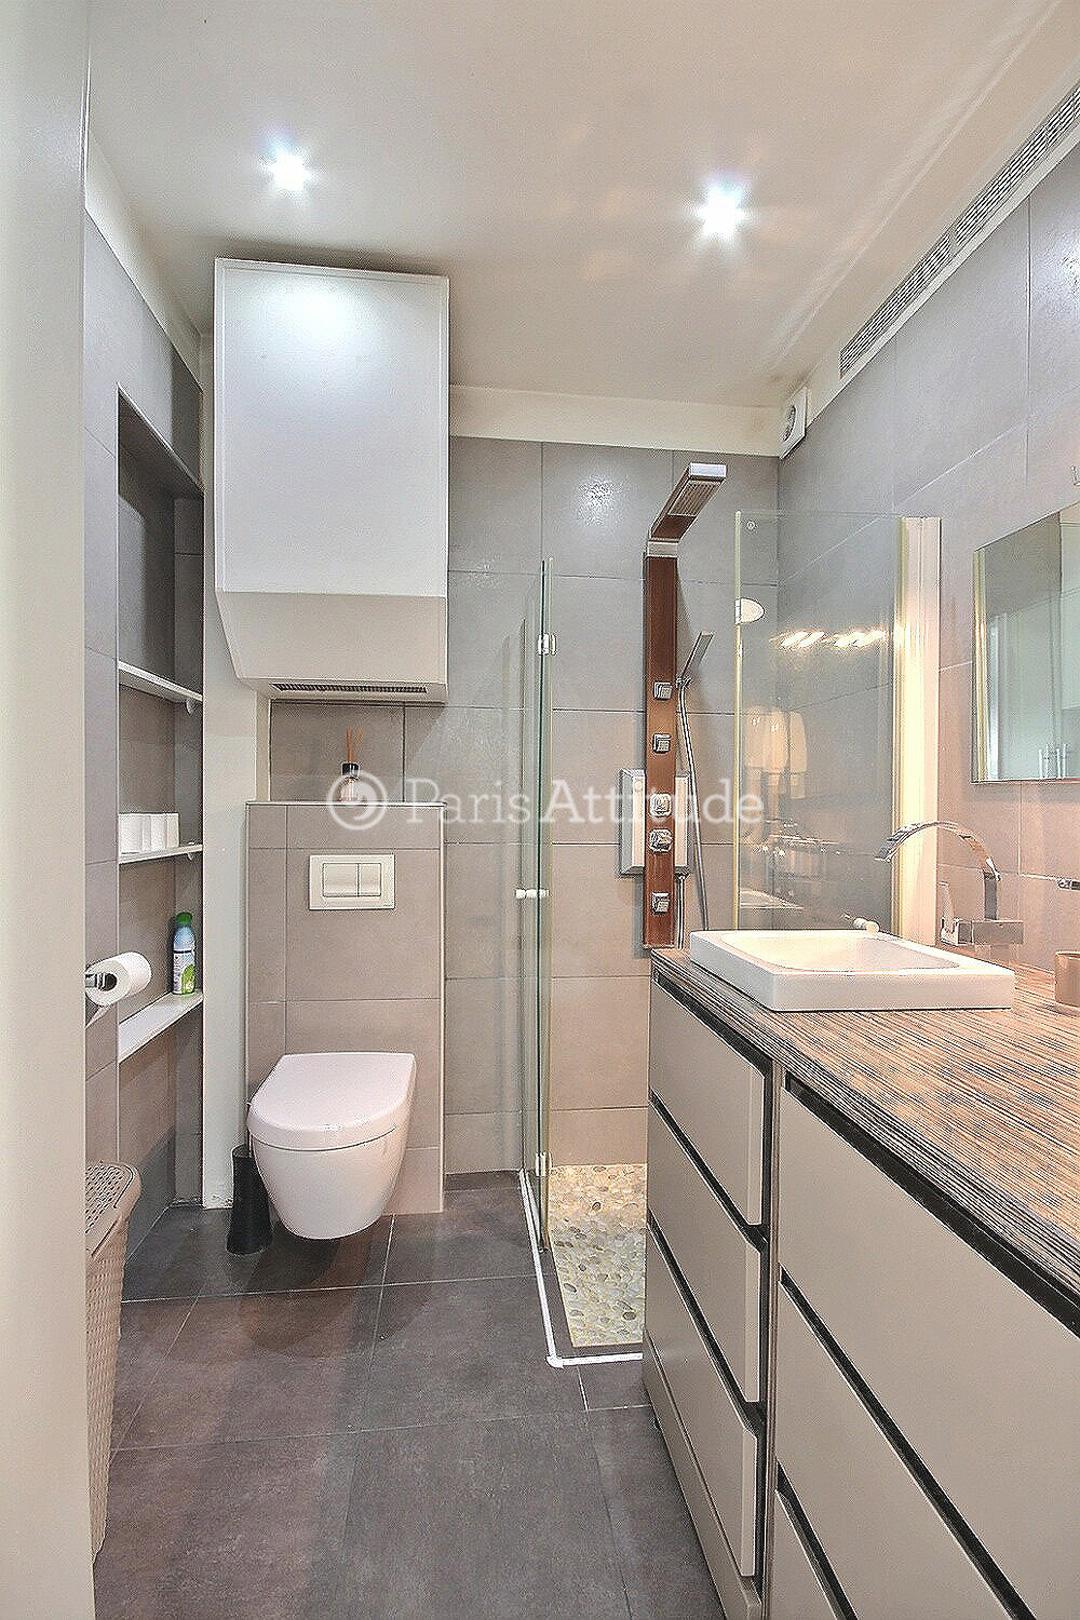 Bathroom remodel ideas pictures